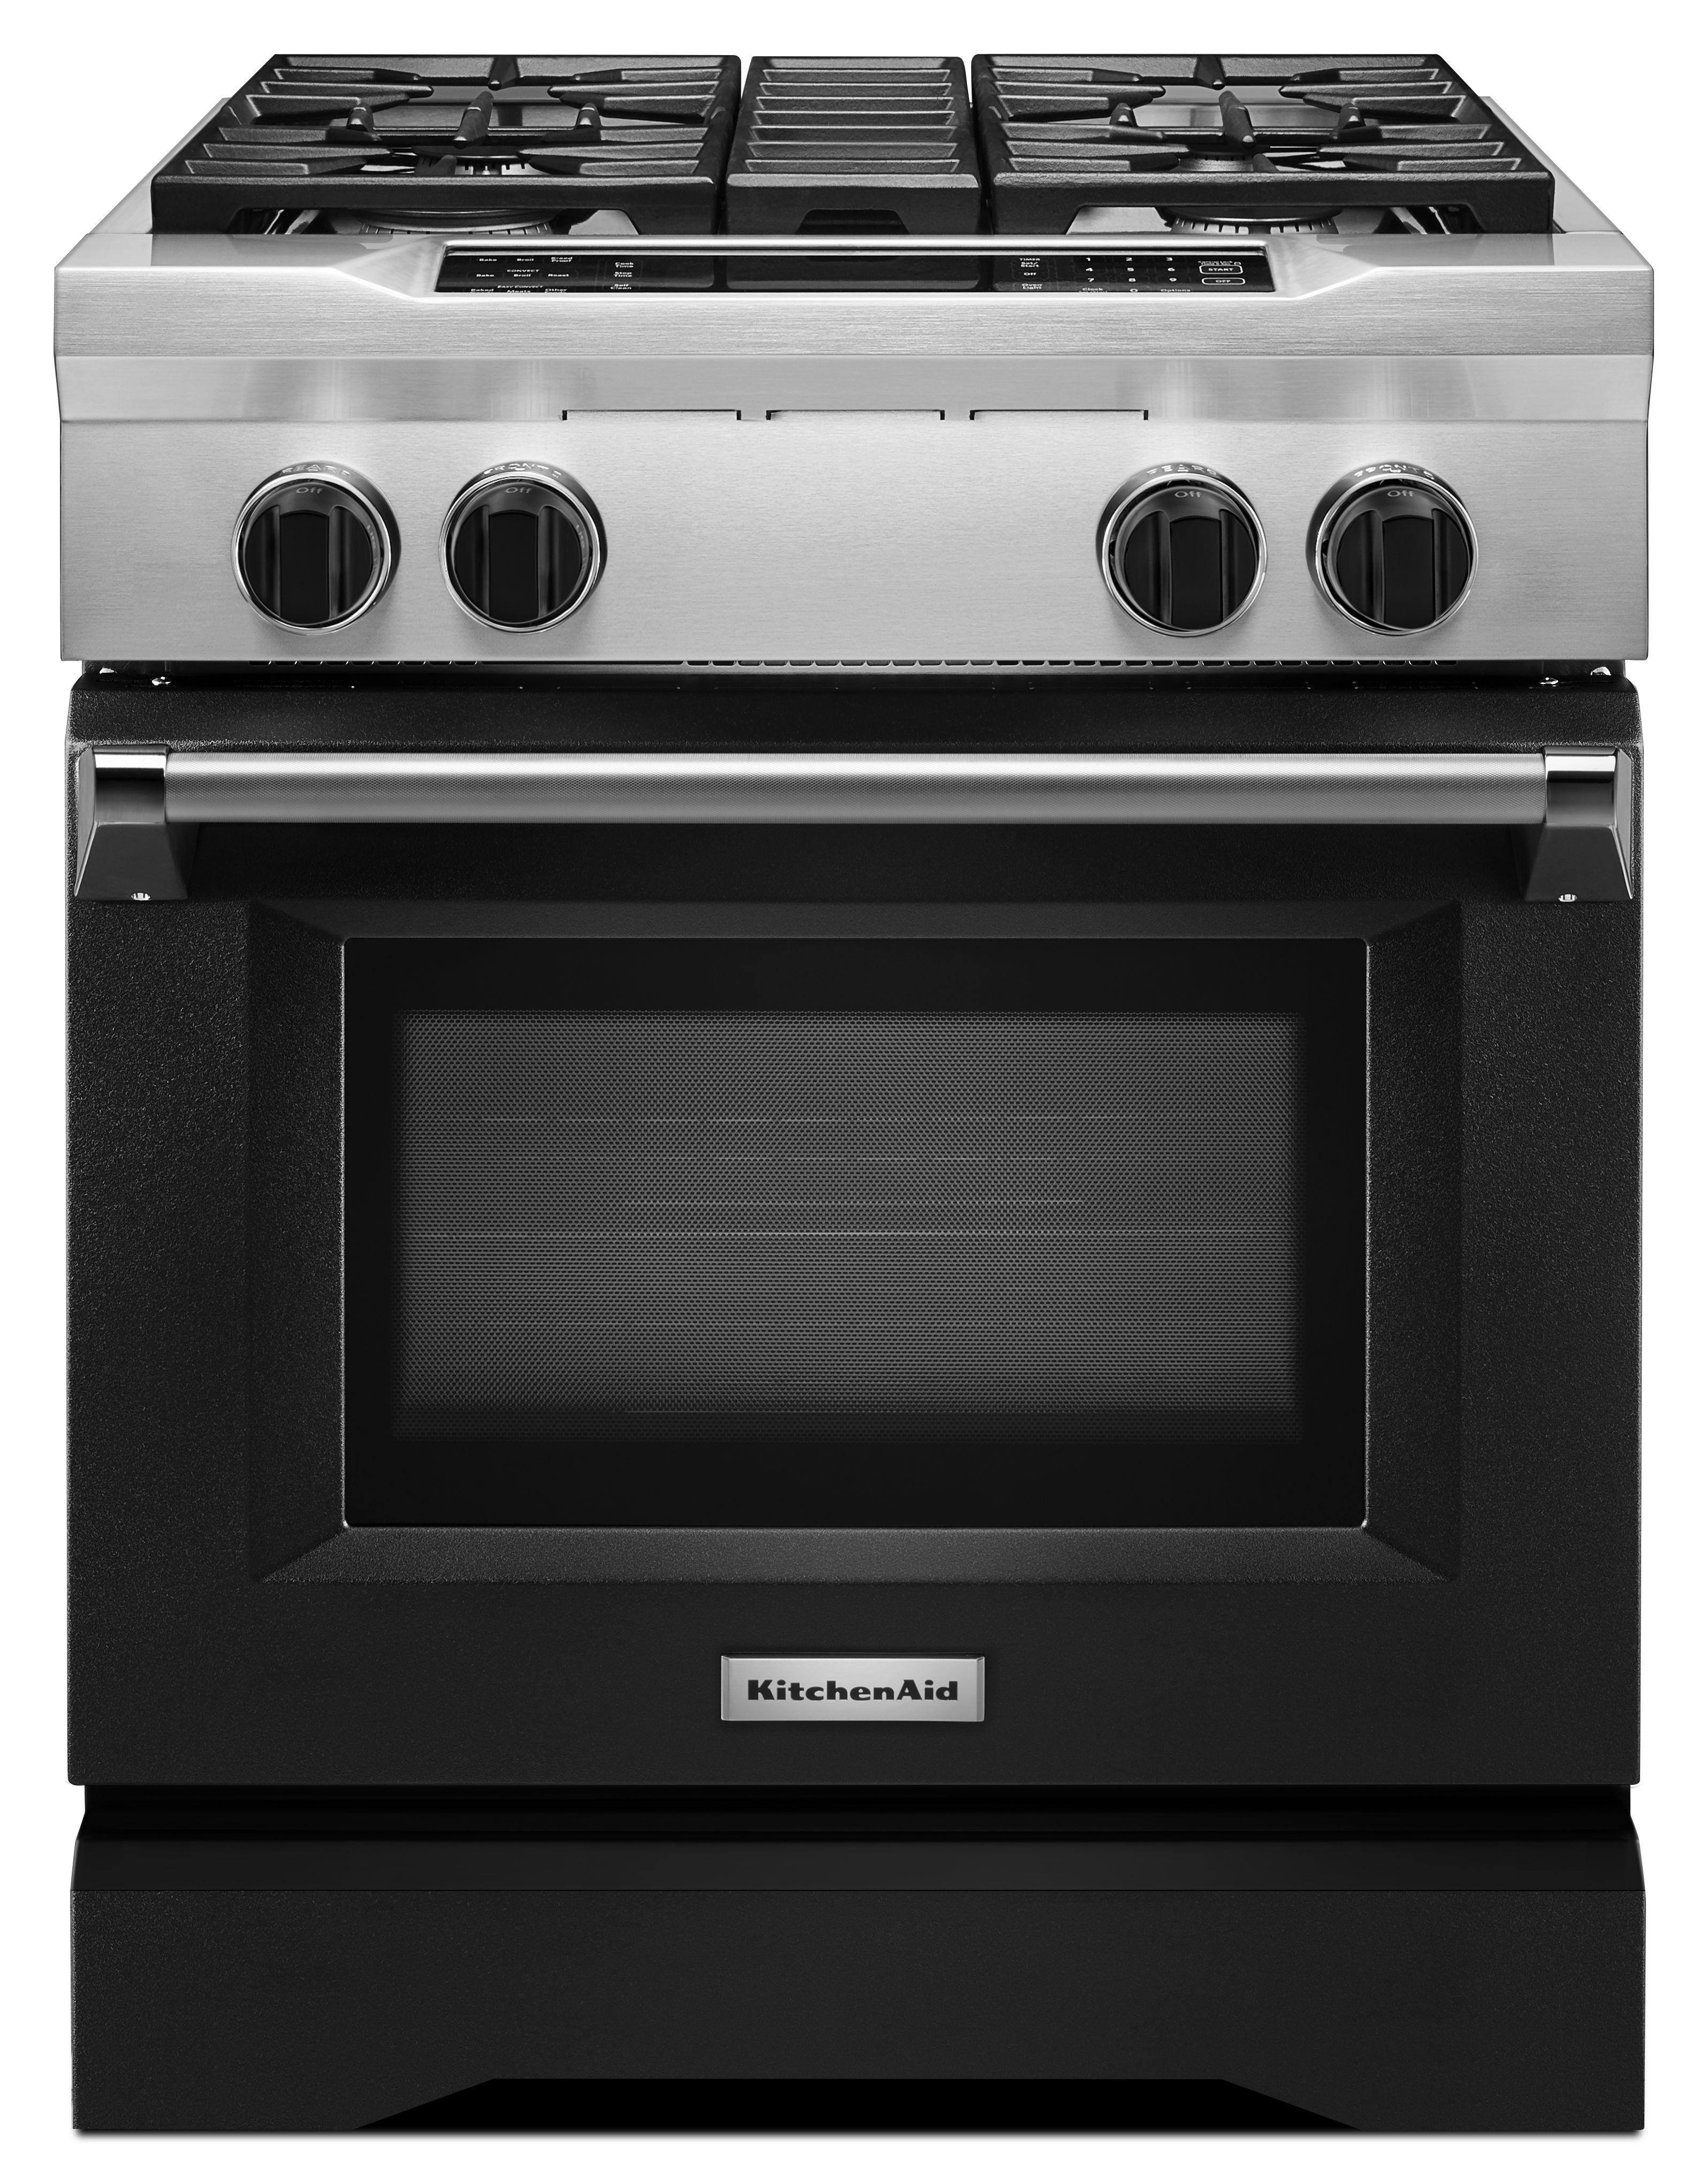 Kitchenaid Commercial Style 30 Pro Dual Fuel Range Imperial Black Kdrs407vbk